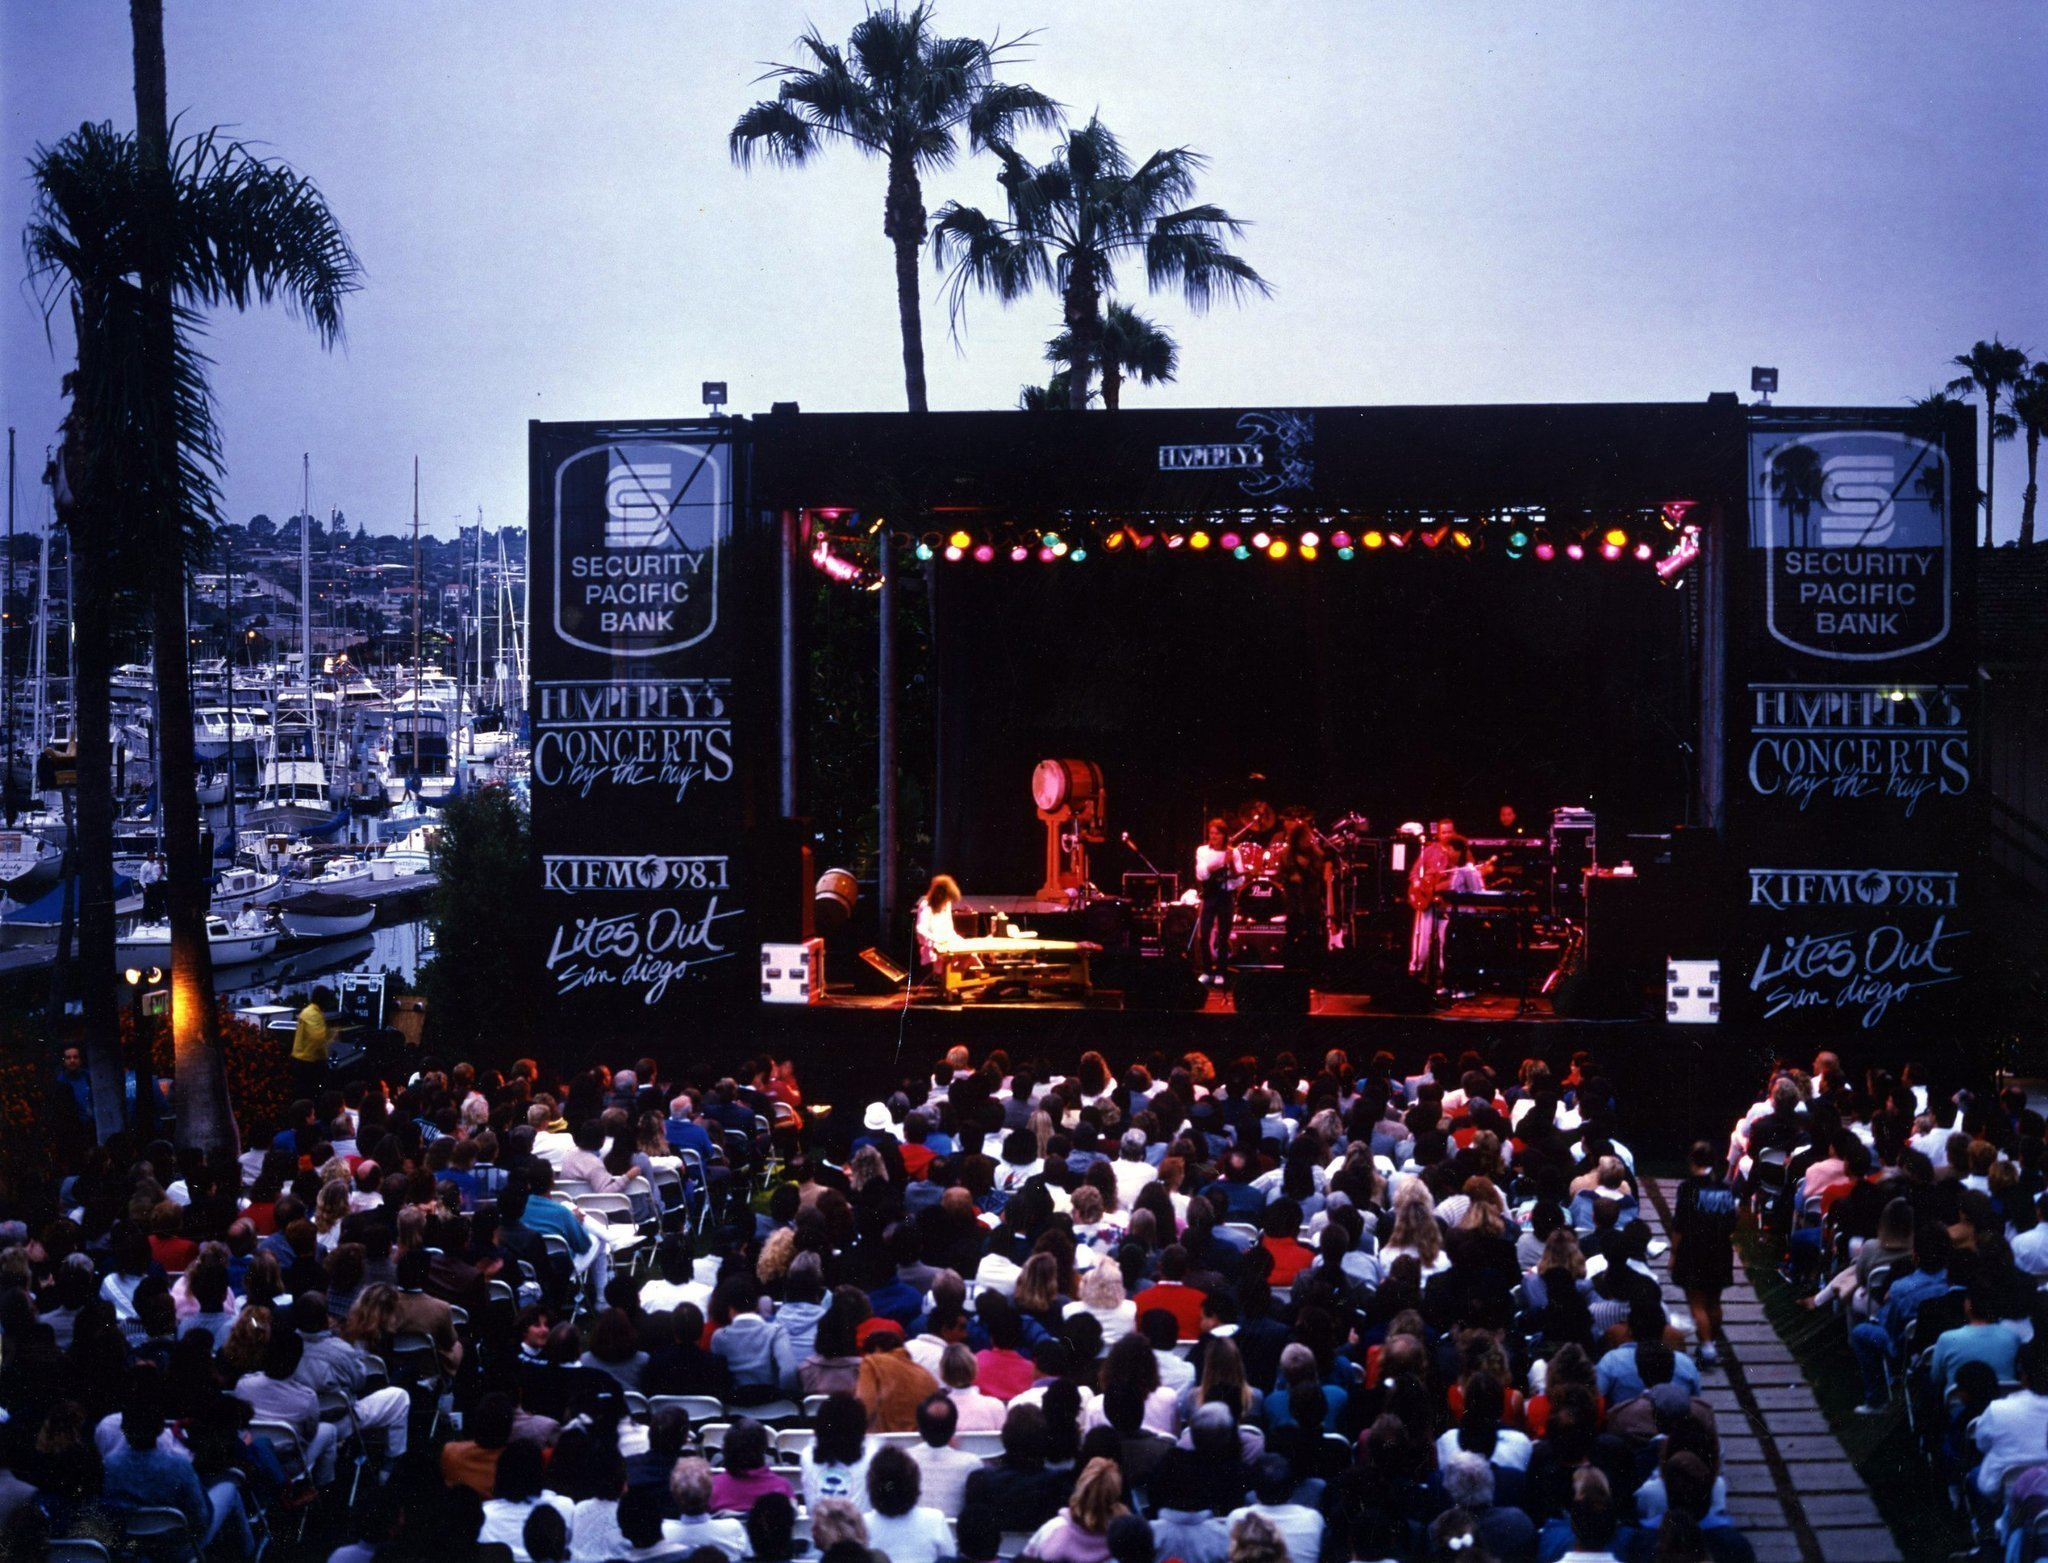 humphrey's concerts celebrates 30th anniversary - the san diego